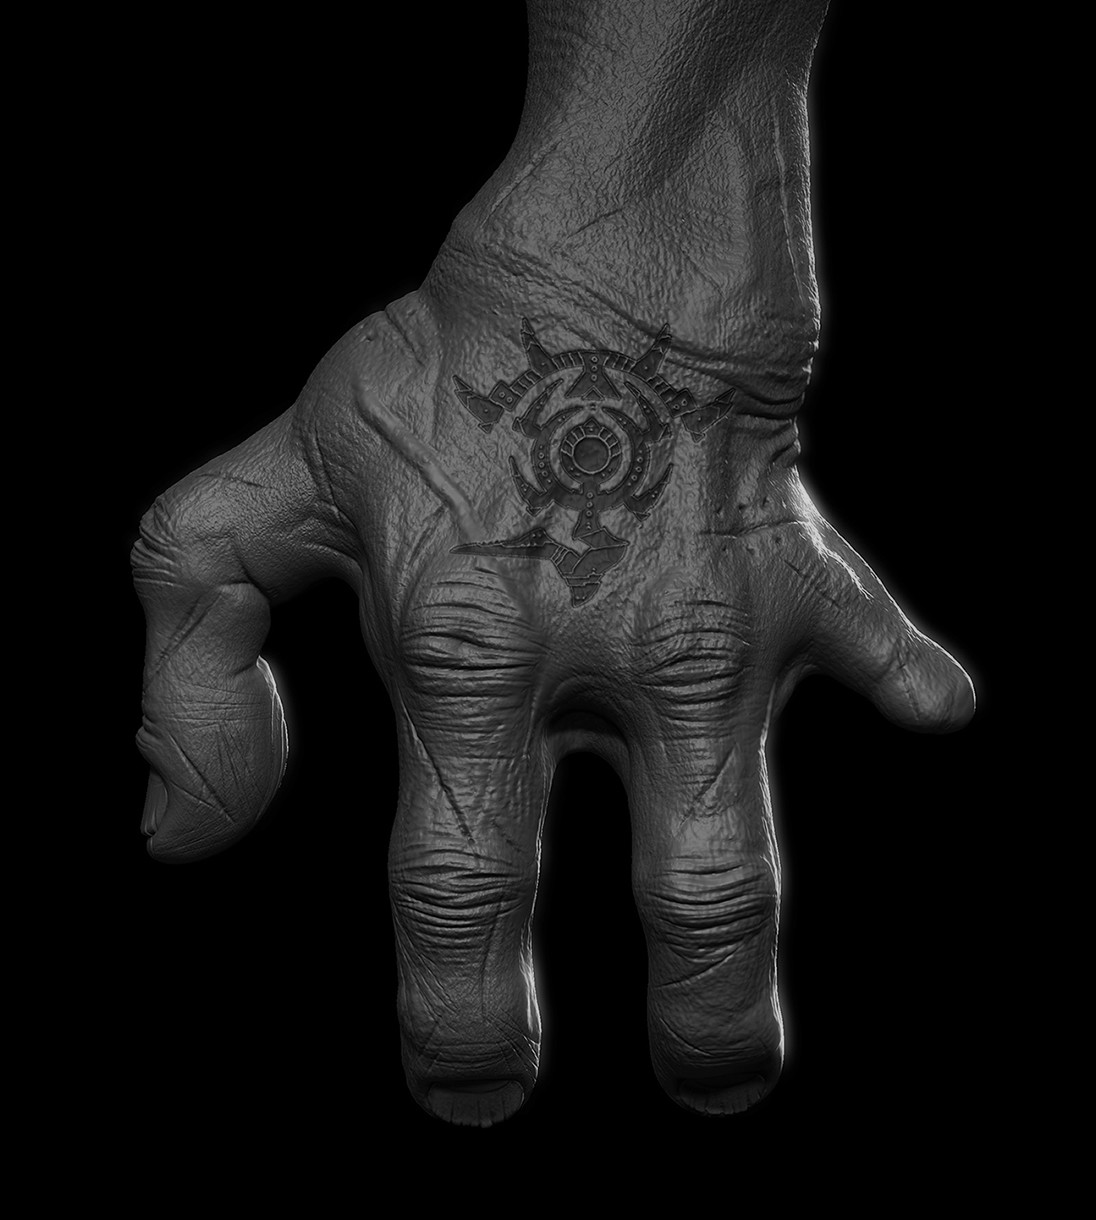 Guillaume lachance oddworld ss hand